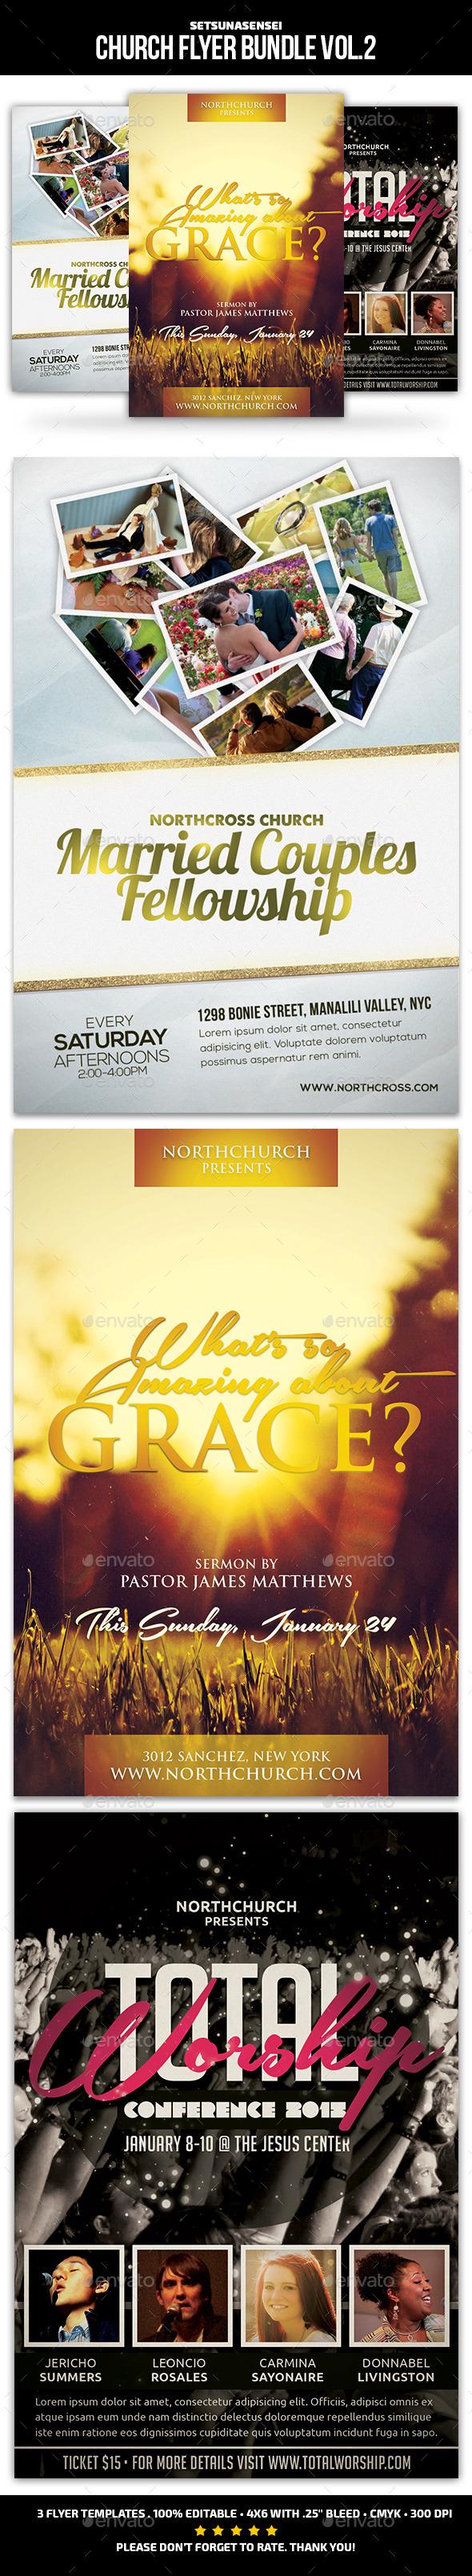 Church Flyer Bundle Vol. 2 - Church Flyers